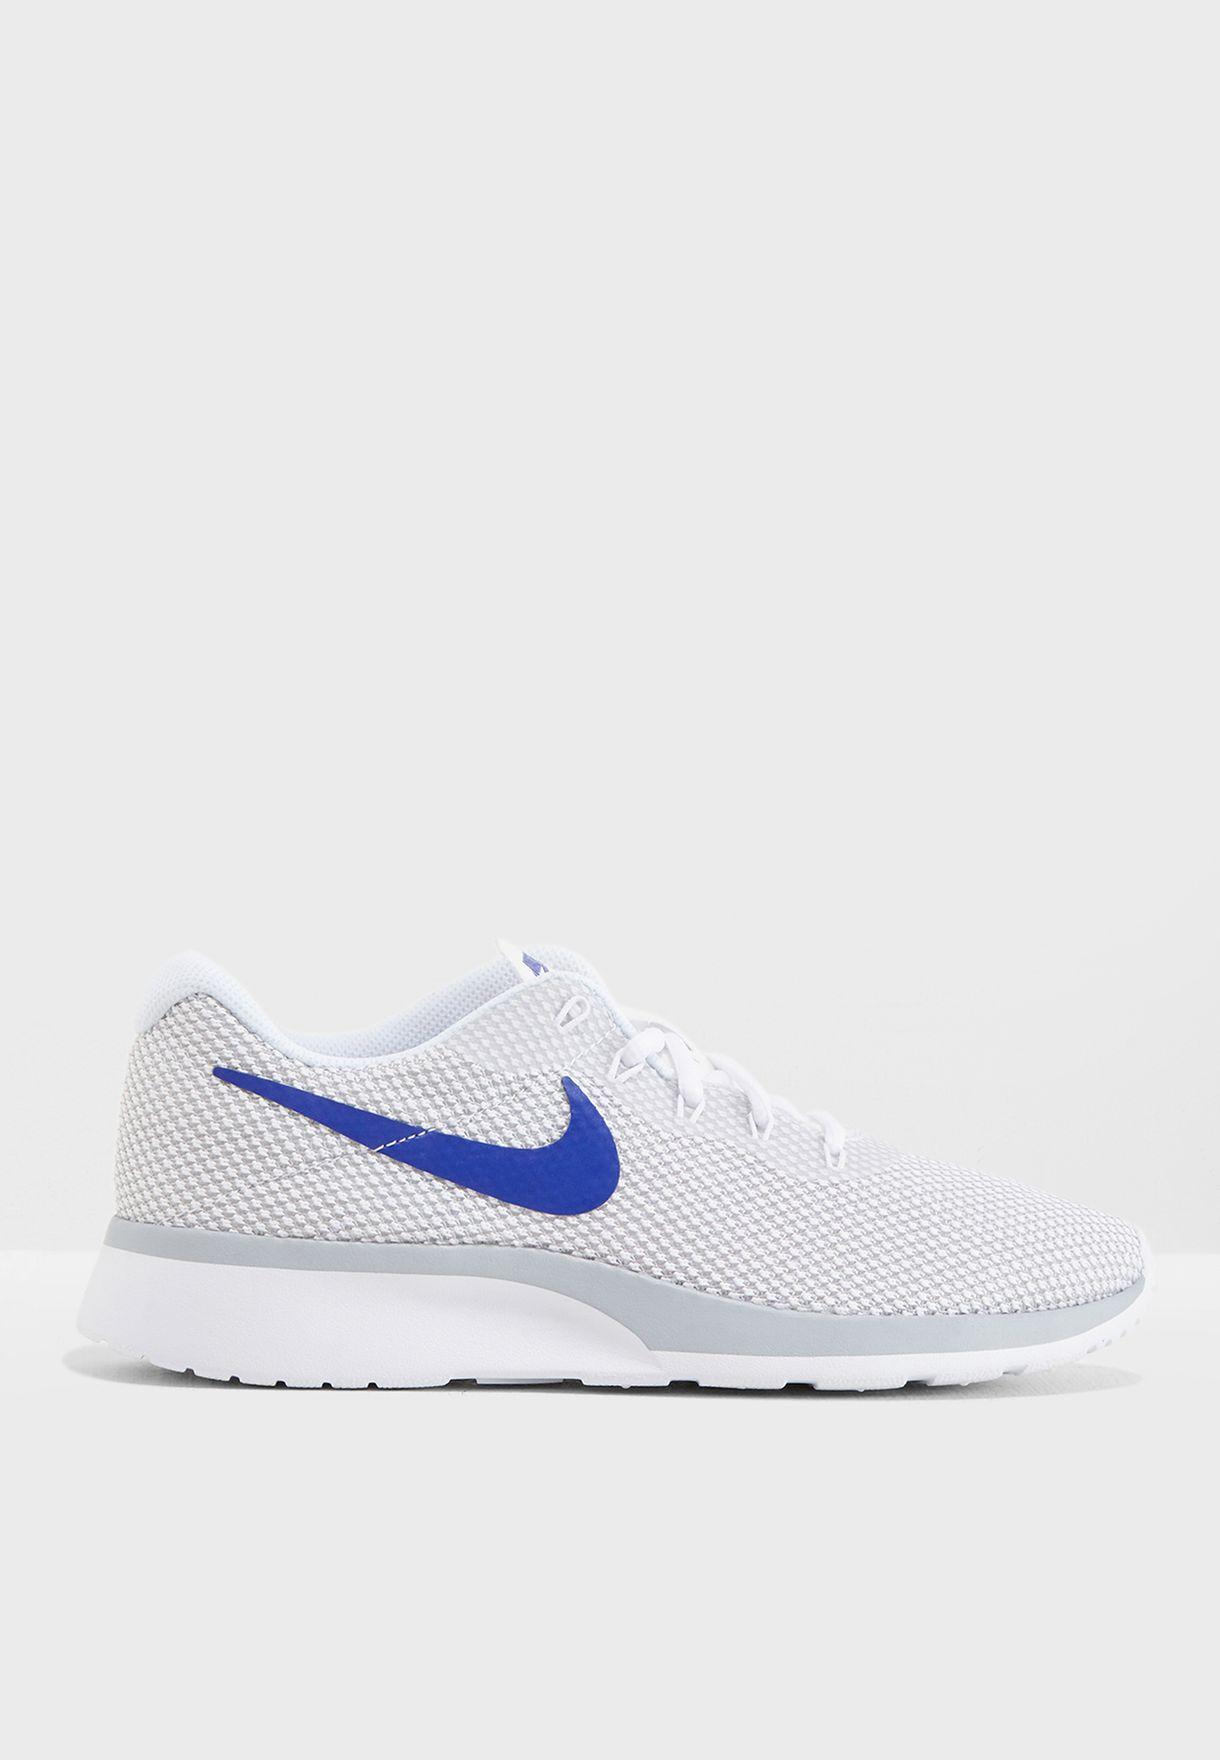 500e5aa8b1d8b تسوق حذاء تانجن ريسر ماركة نايك لون متعدد الألوان 921668-103 في ...